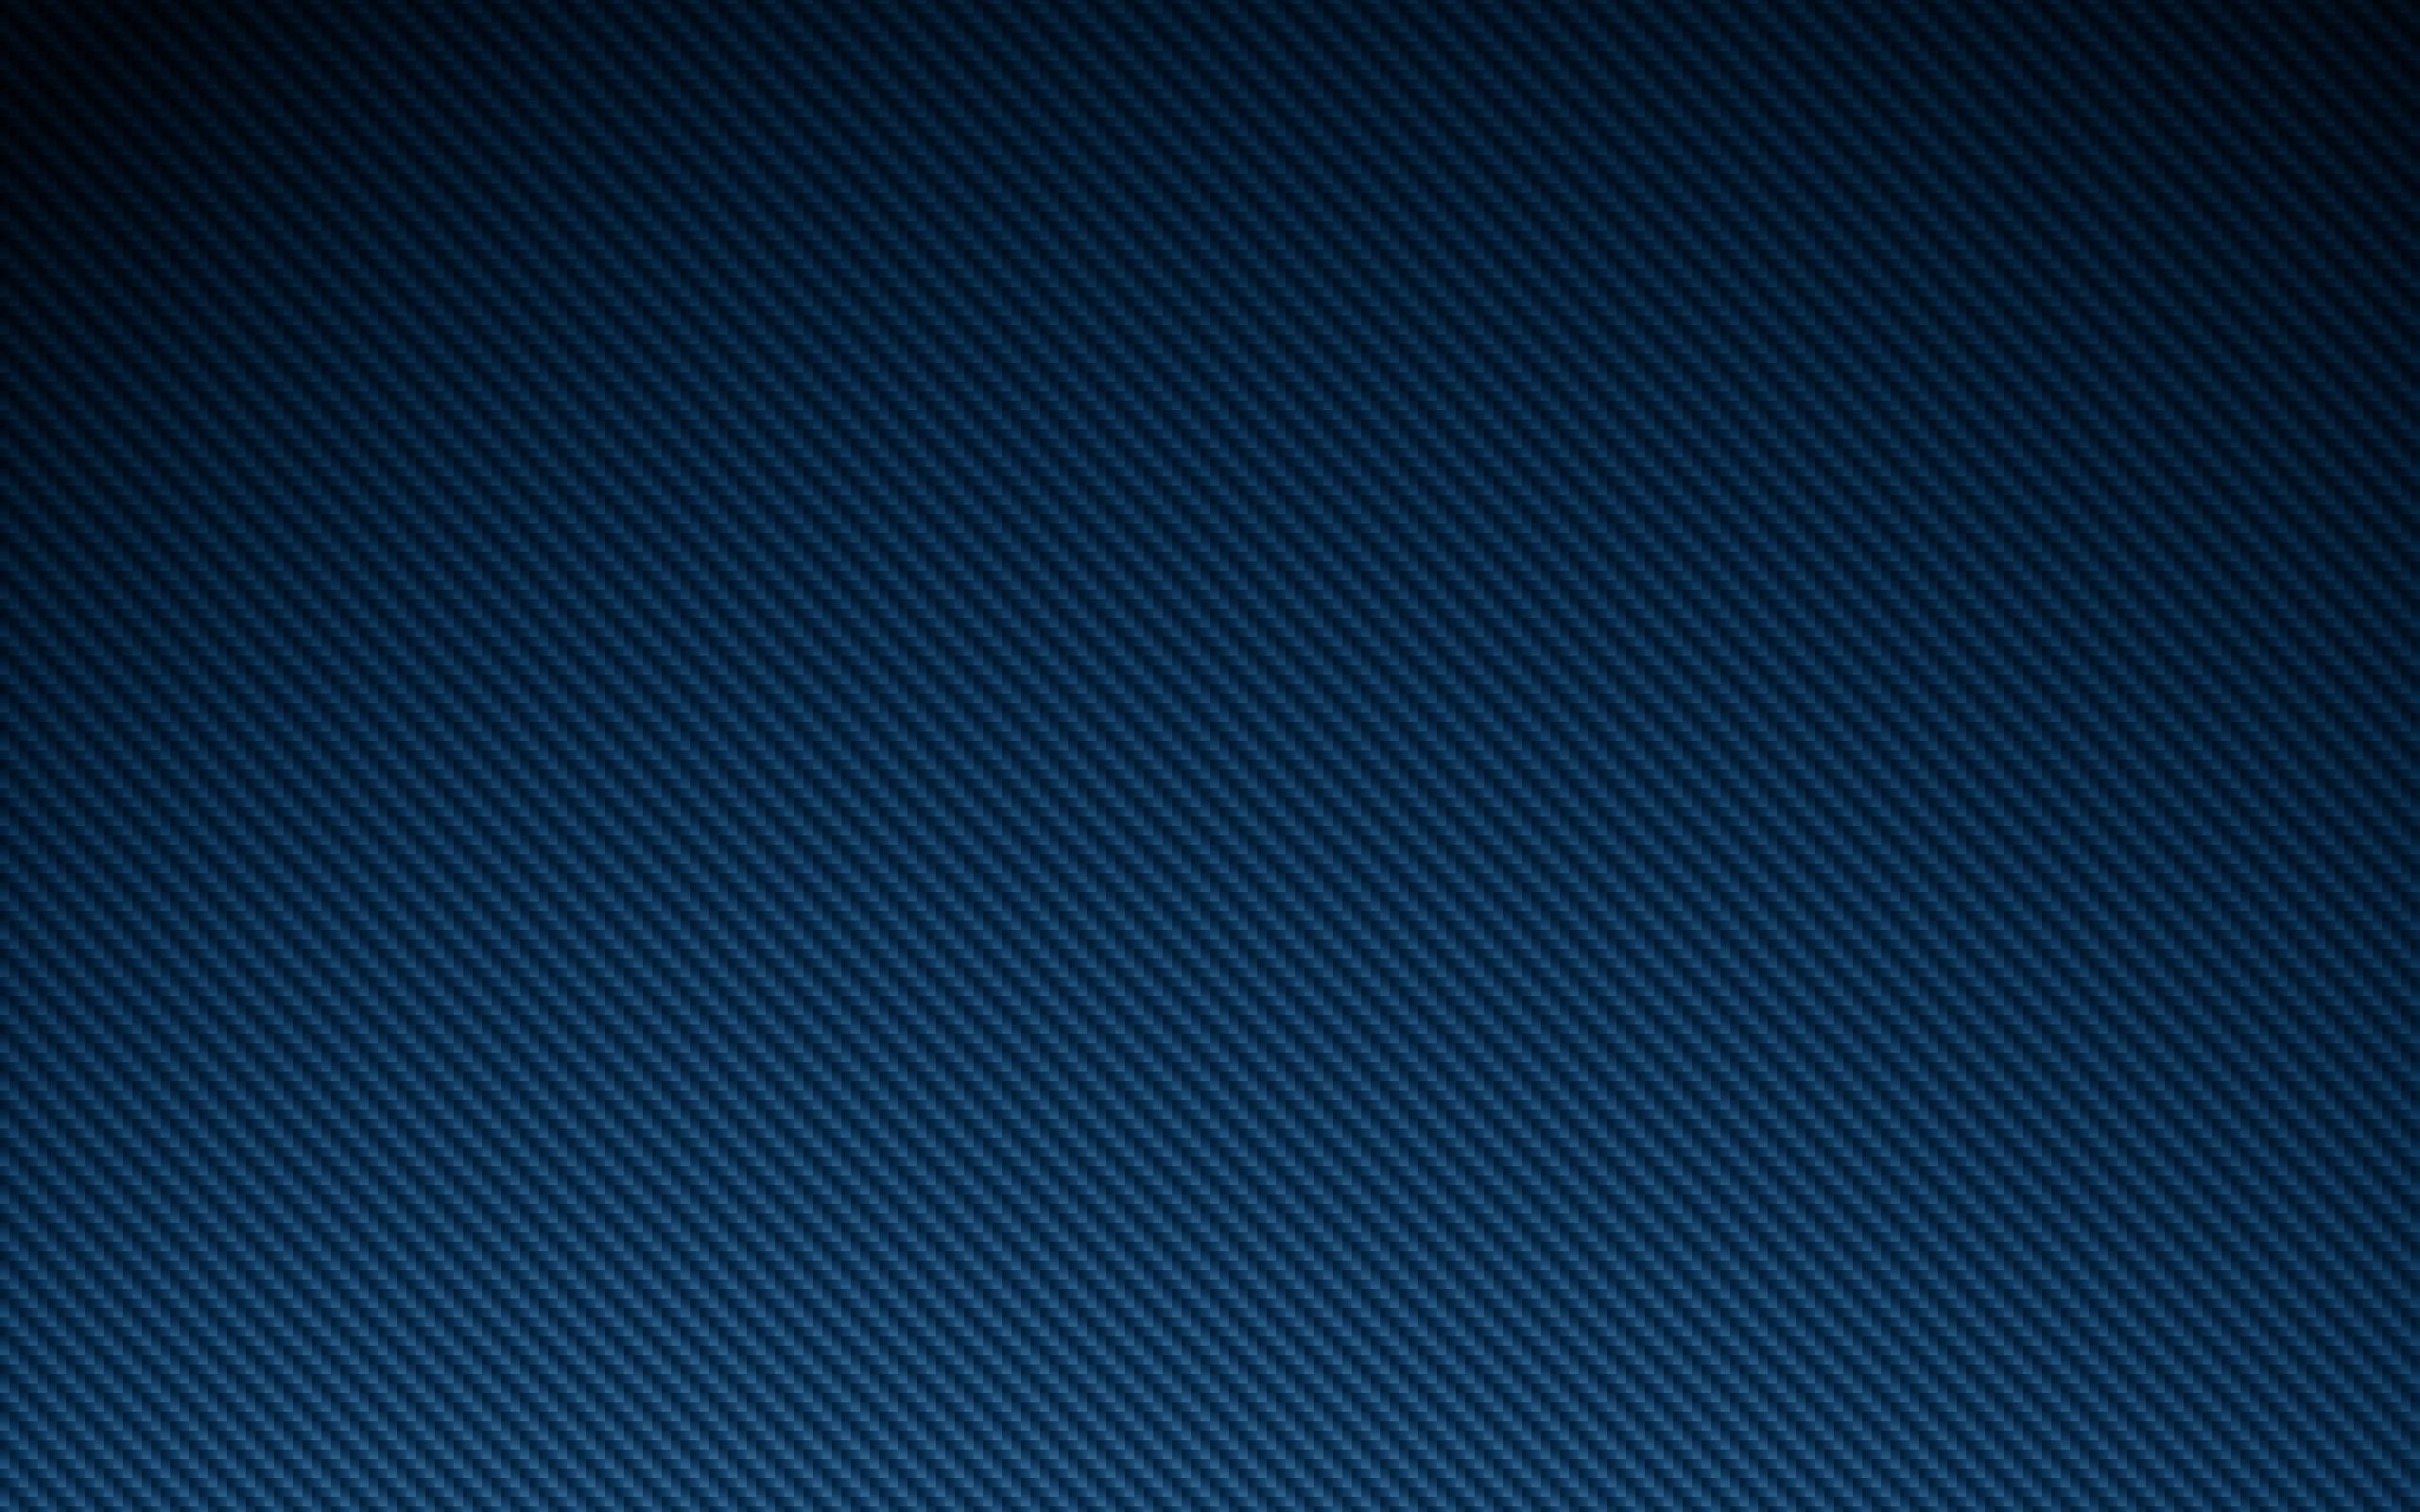 Wallpaper-Art-blue-carbon-fiber-pictures-HD